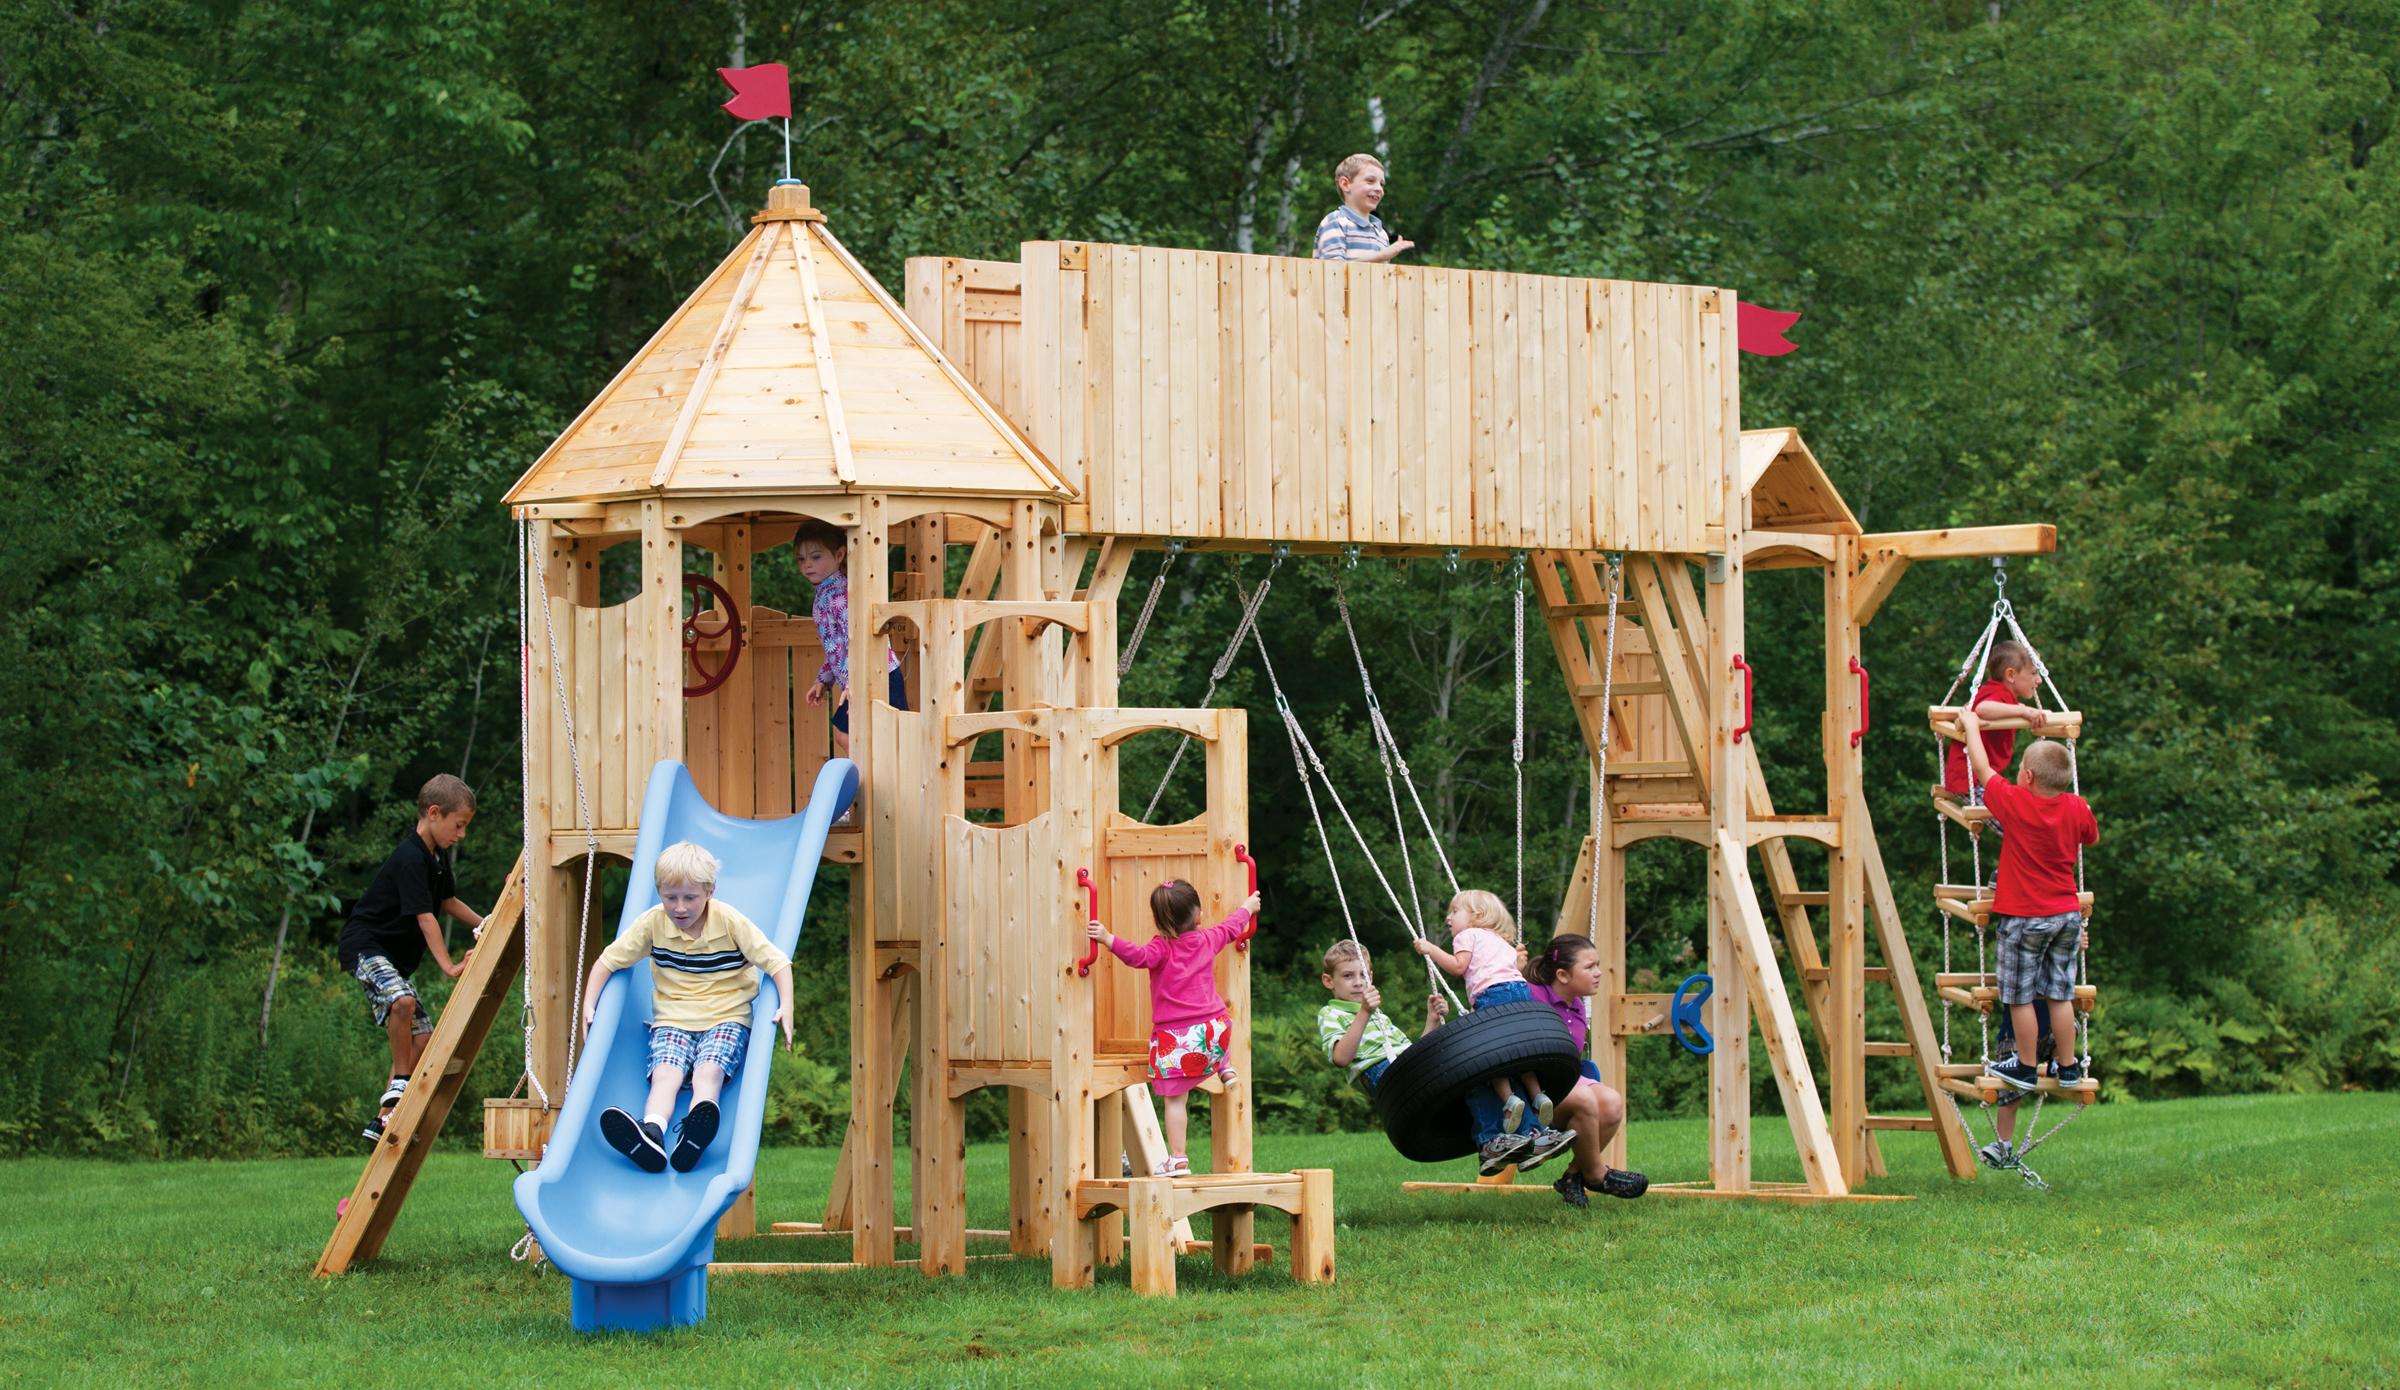 Cedar view swing set wooden 2015 best auto reviews - Columpios para jardin ...